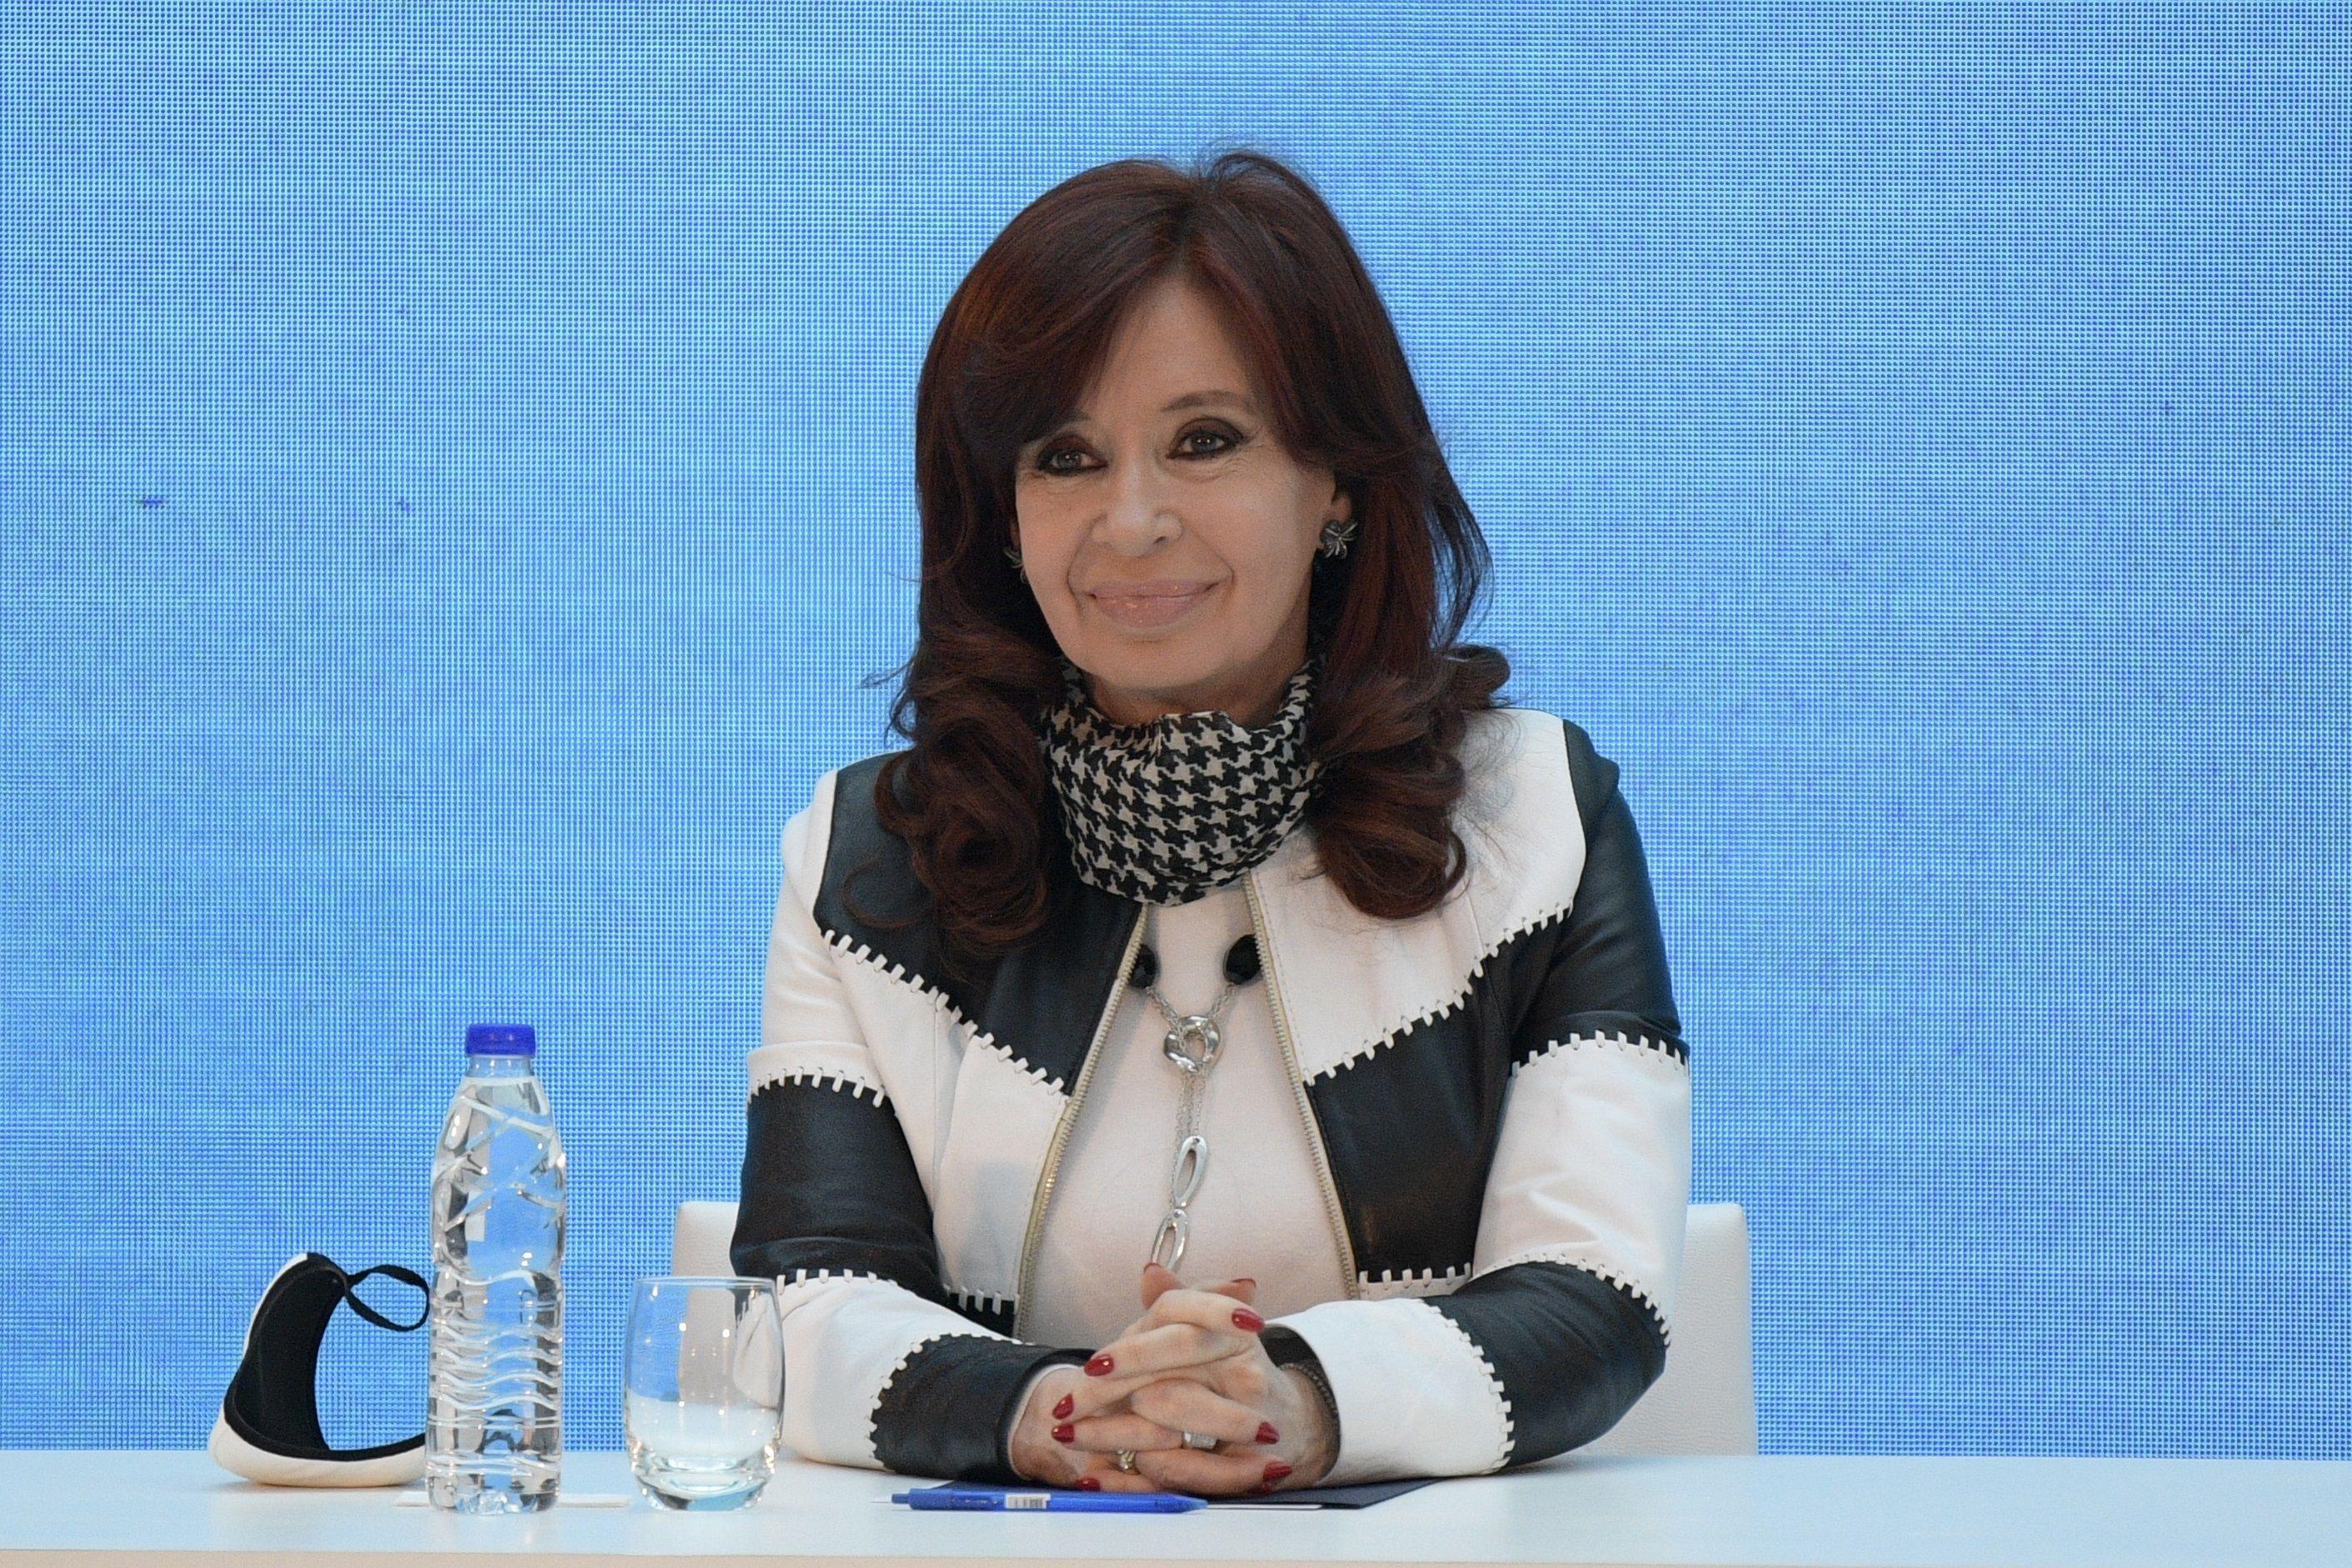 La vicepresidenta Cristina Kirchner. (EFE/ Juan Mabromata/Archivo)